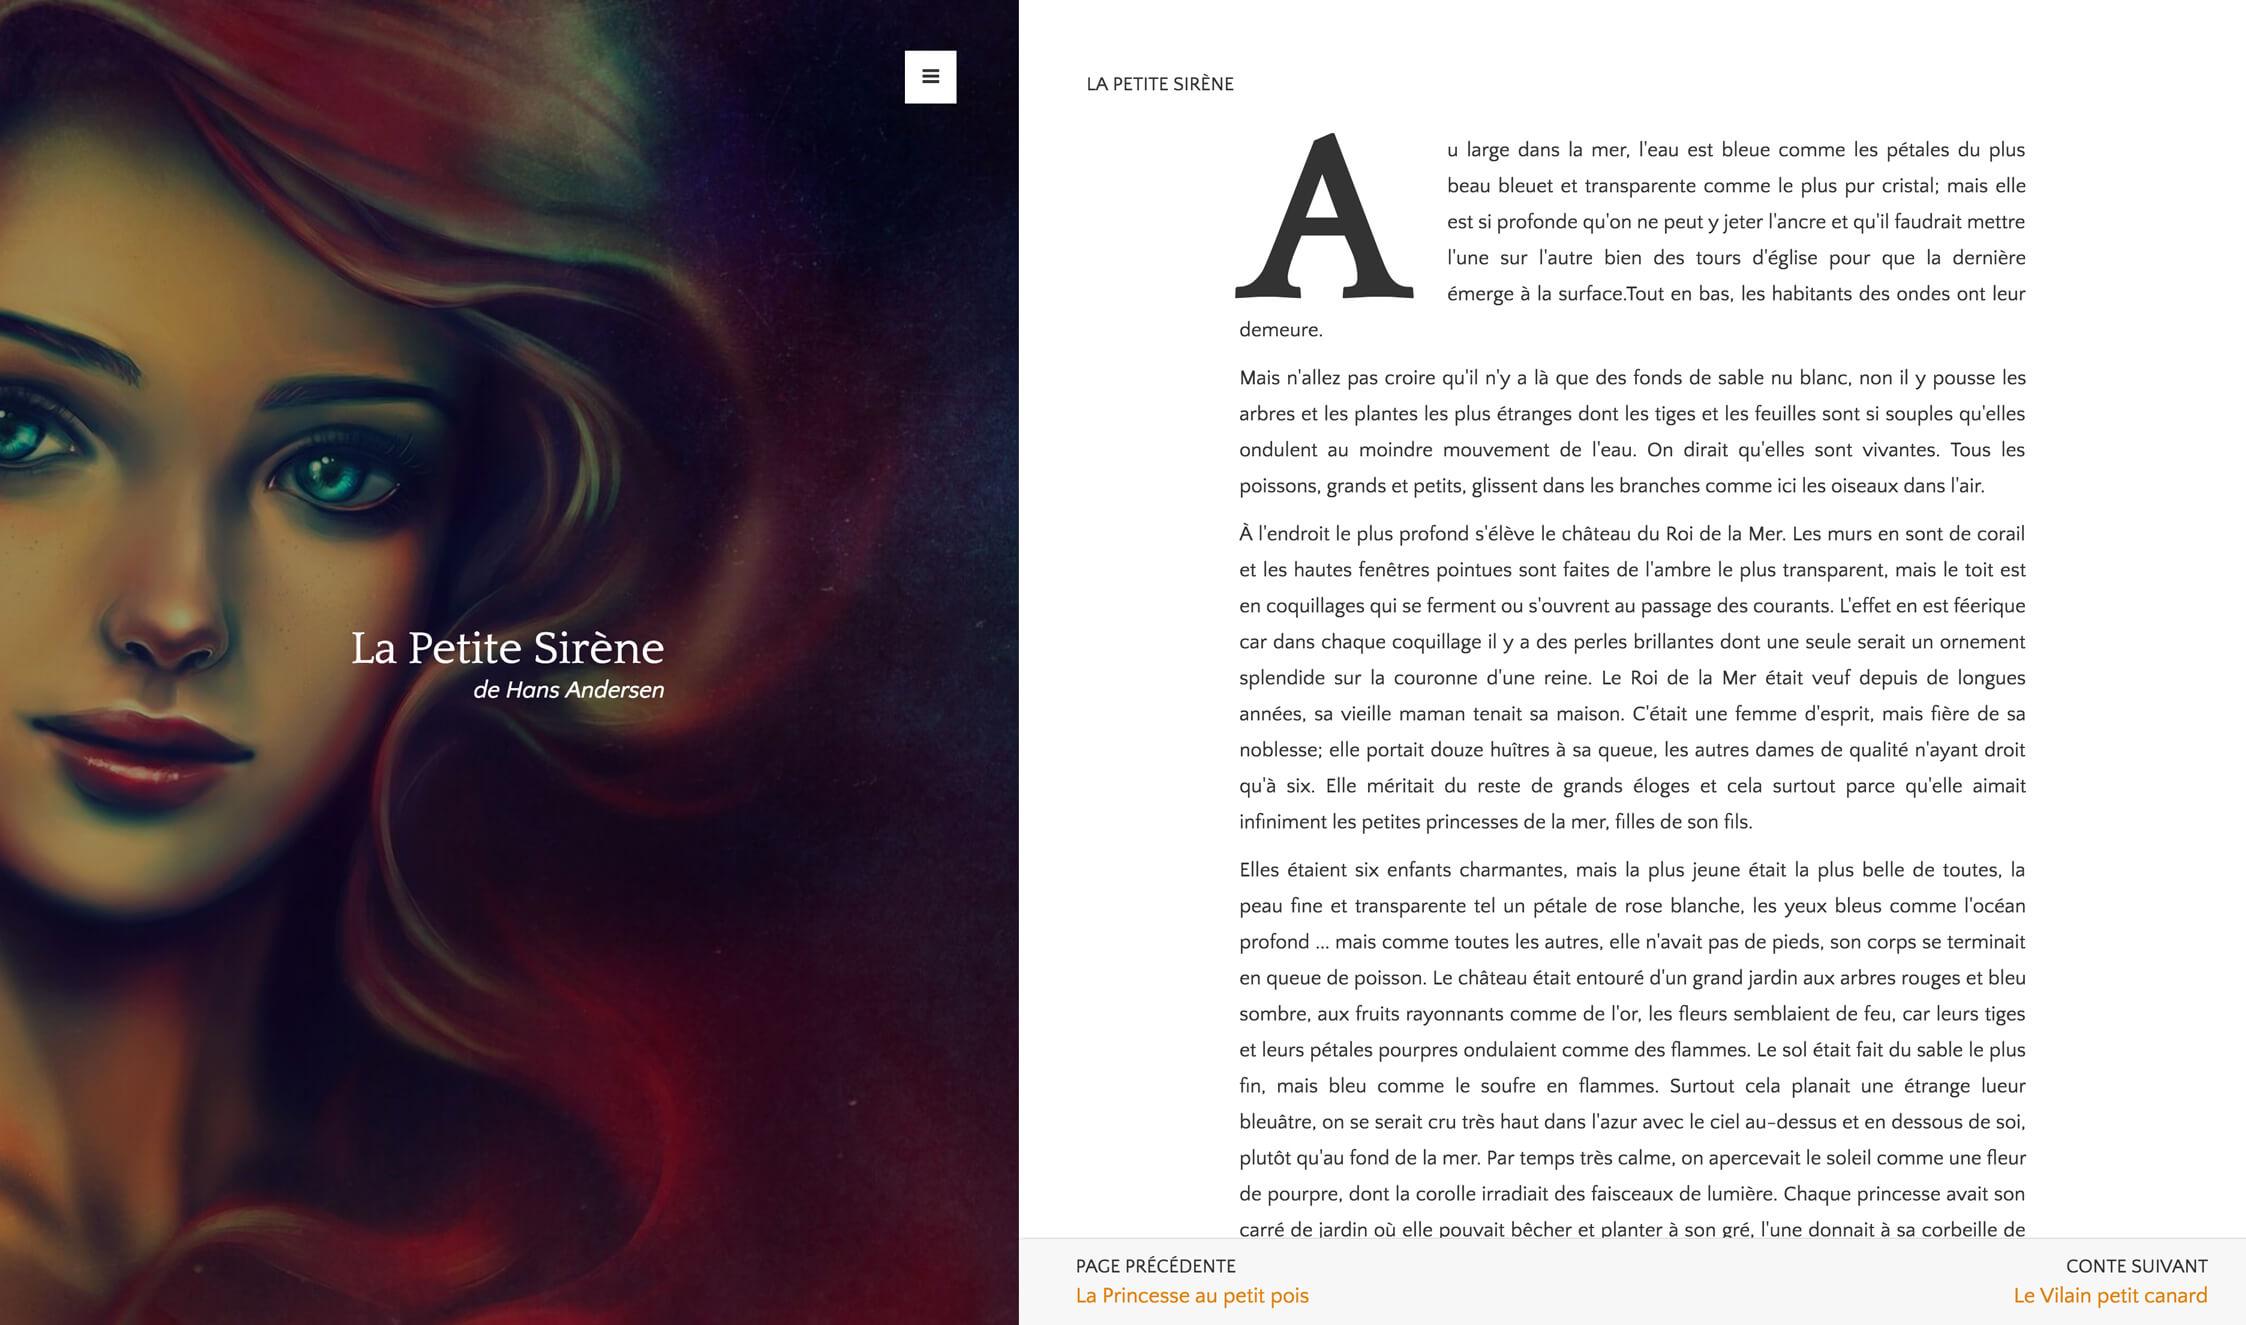 la petite sirène - blaise posmyouck, web designer